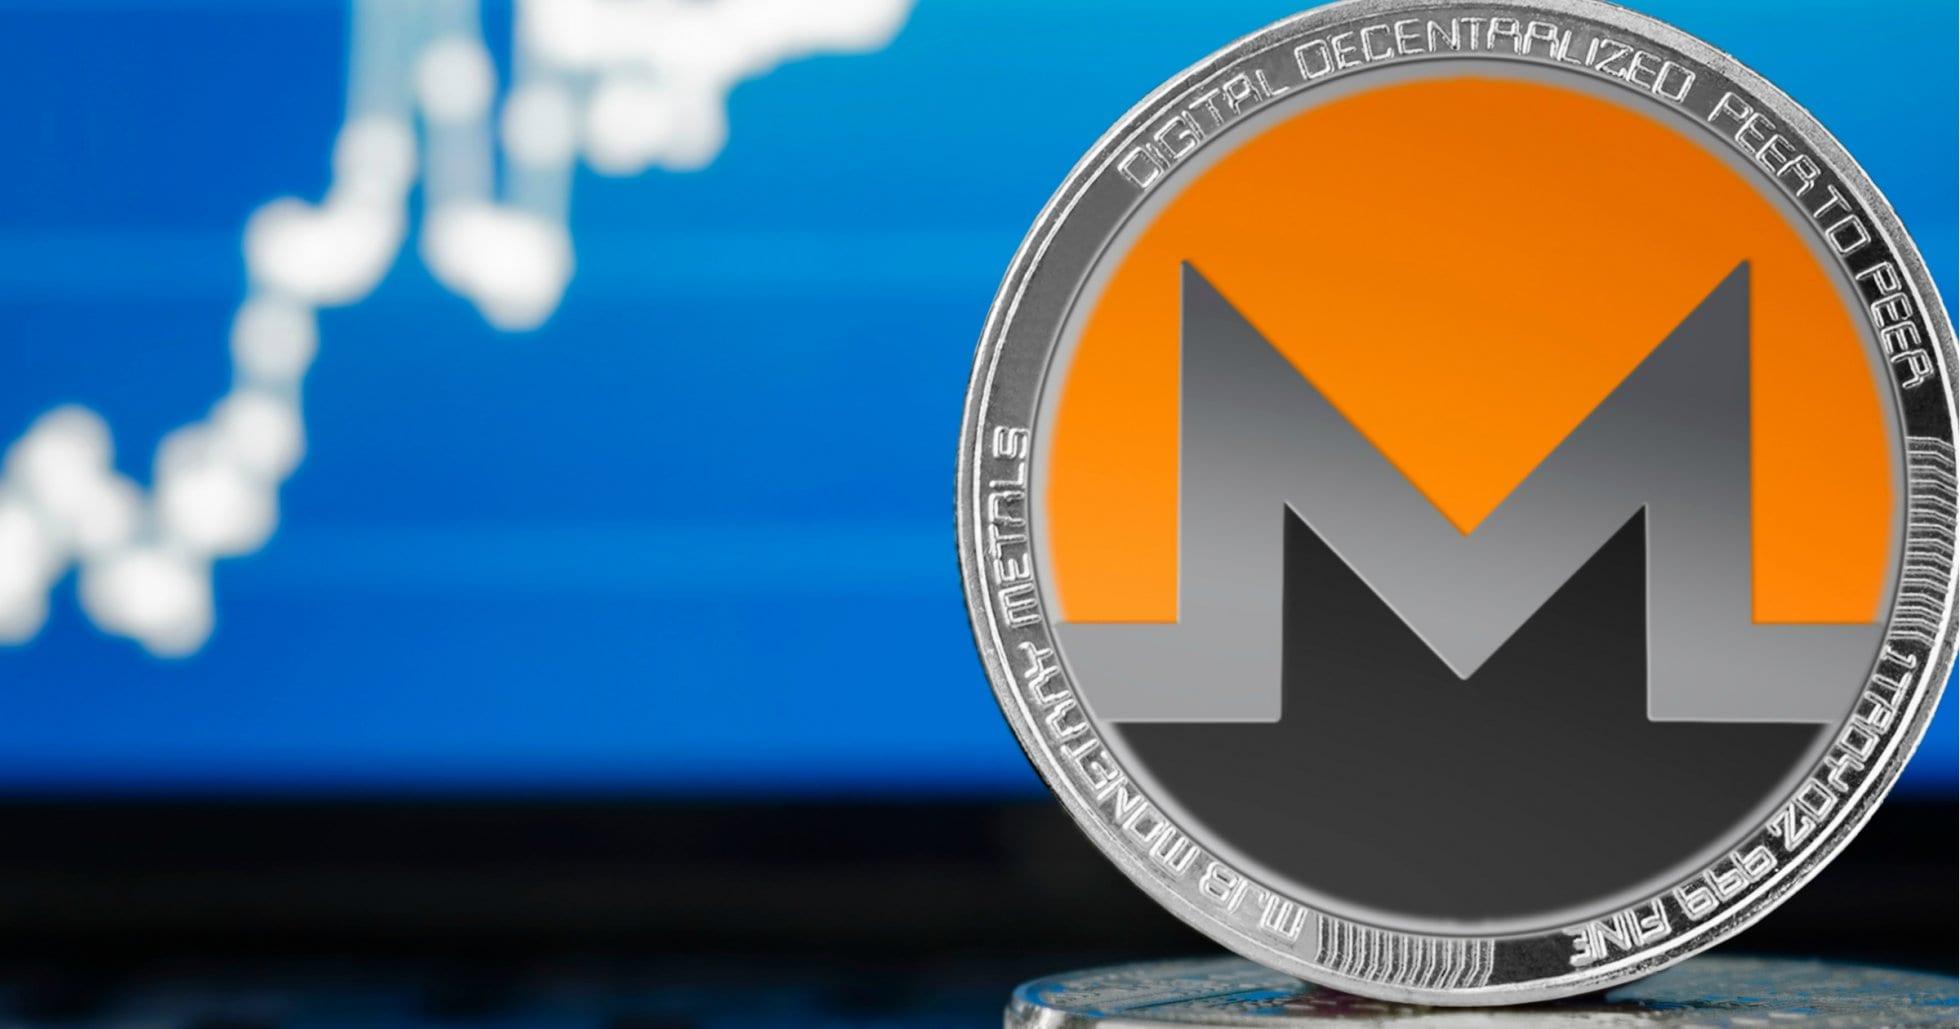 monero cryptocurrency price 1960x1029 e07175dbec11c1e8c7396f8c6bc27ead - Monero Price Prediction For 2019: XMR To Hit $638